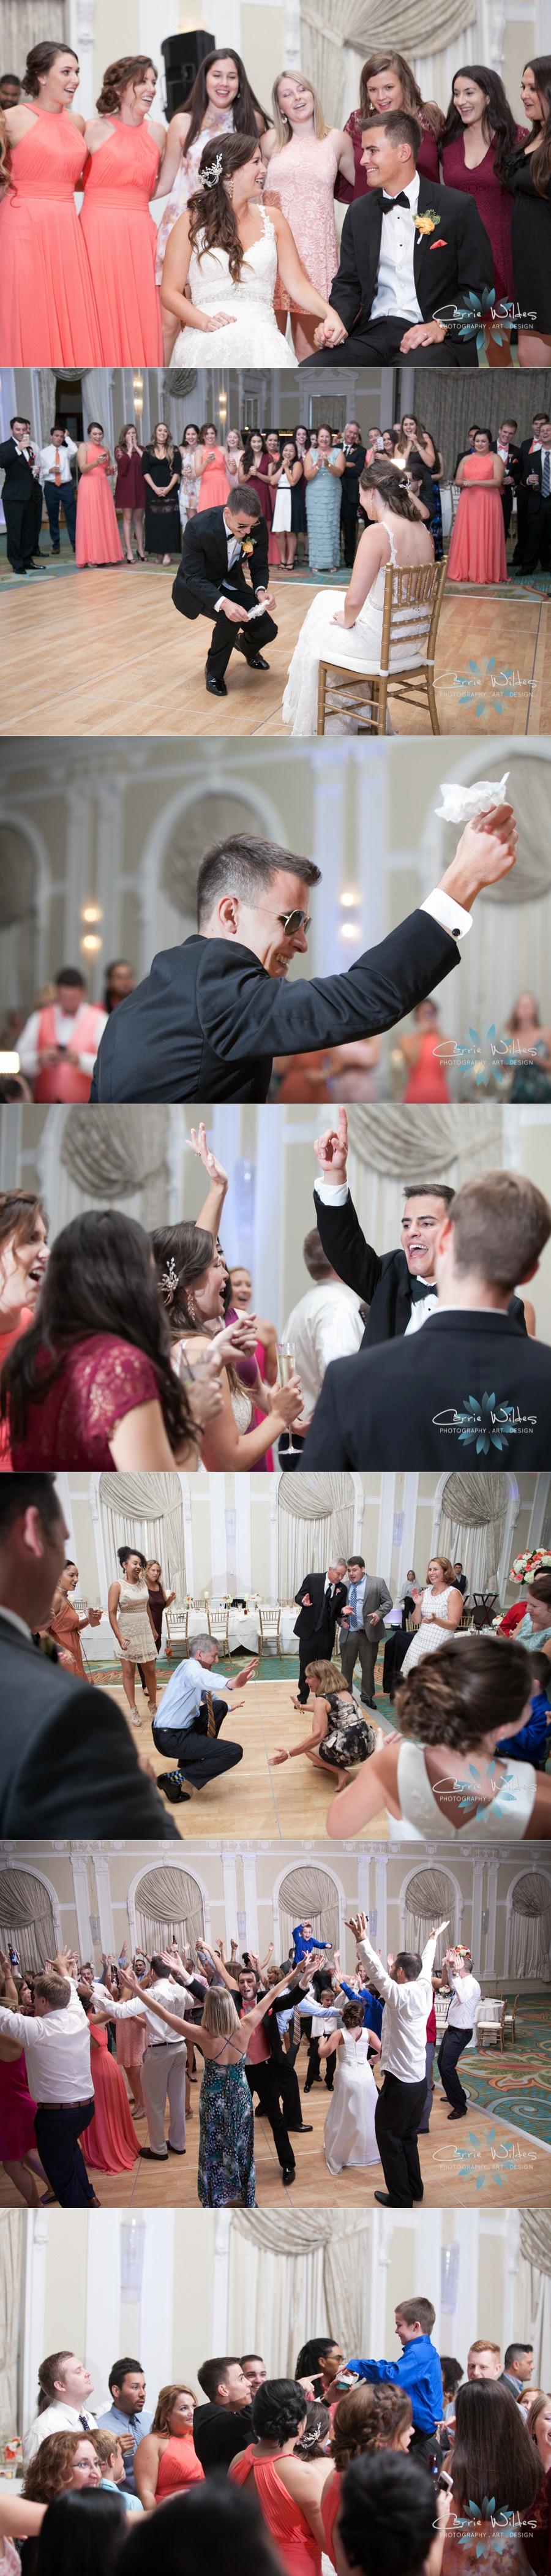 9_17_16 Jessica Marc Renaissance Vinoy Wedding_0038.jpg